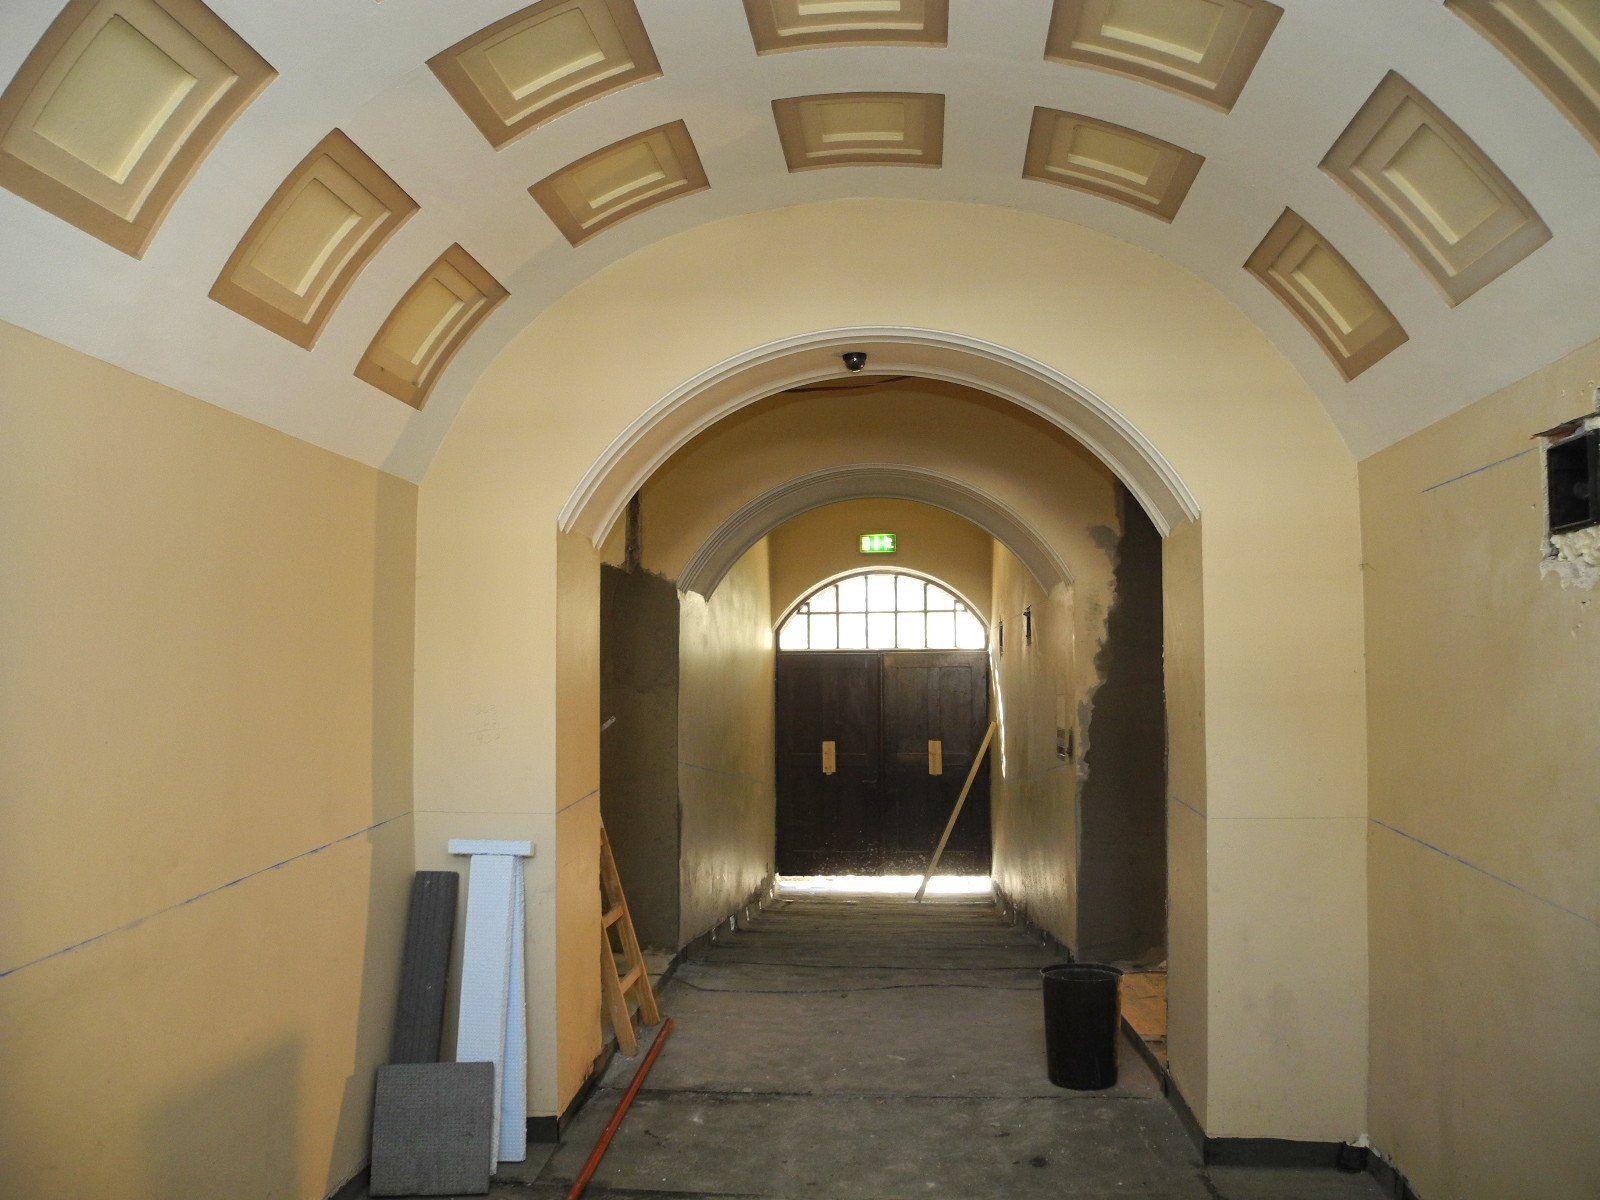 Der Eingang zur Bezirkshauptmannschaft Feldkirch wird behindertengerecht eingerichtet.